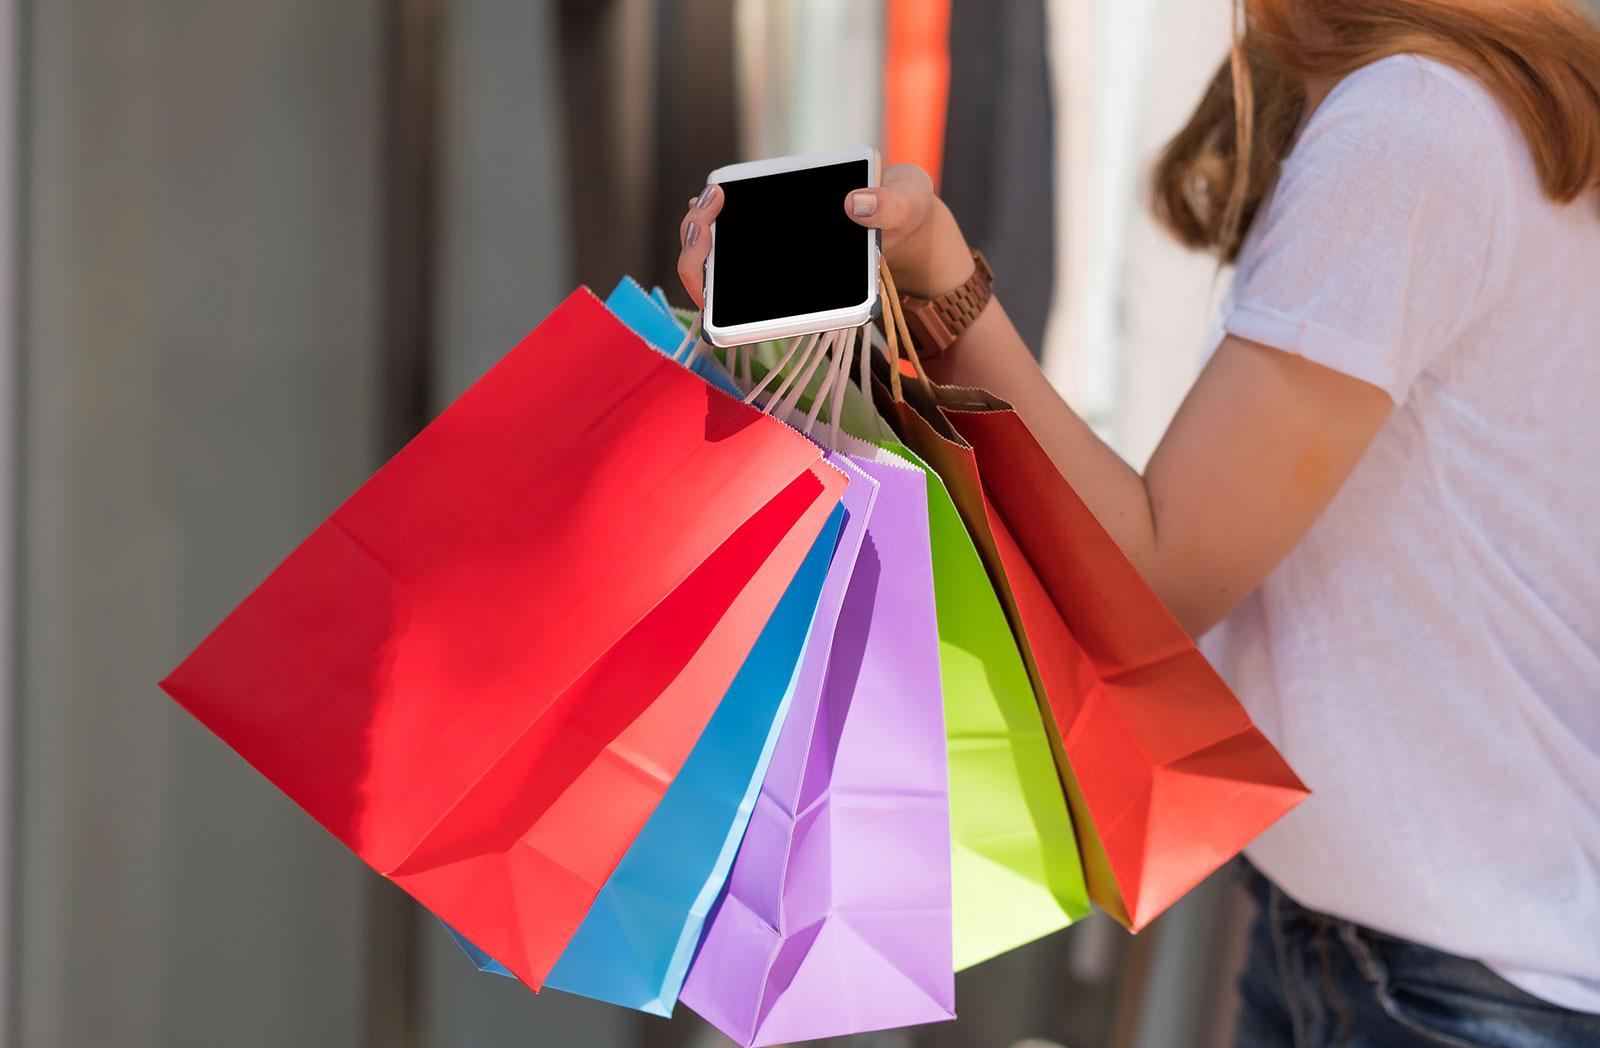 mobil e-ticaret zamanı